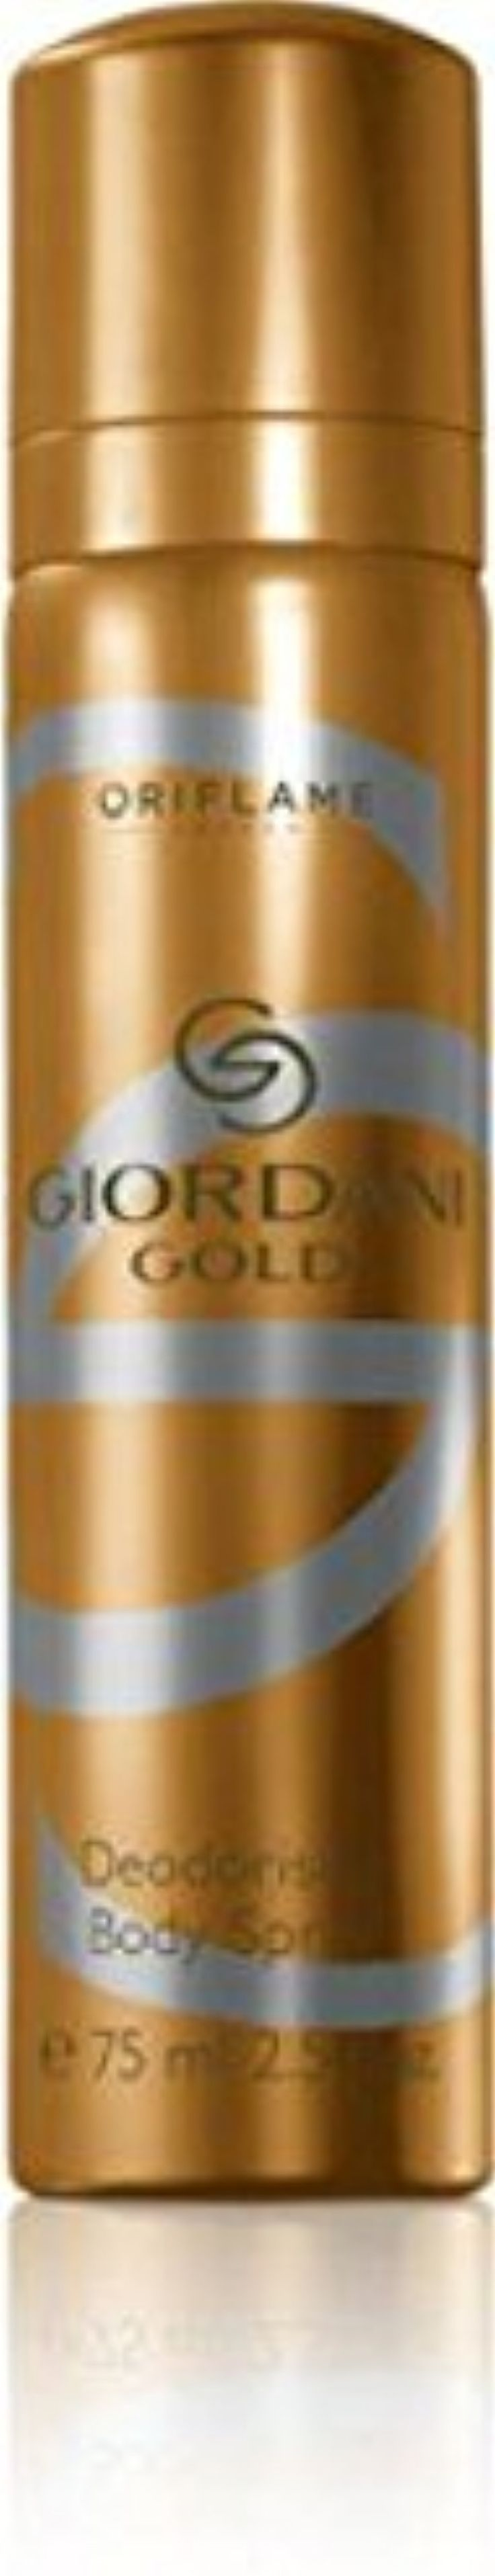 Oriflame Sweden Giordani Gold Deodorising Spray Body Spray For Men Boys Girls